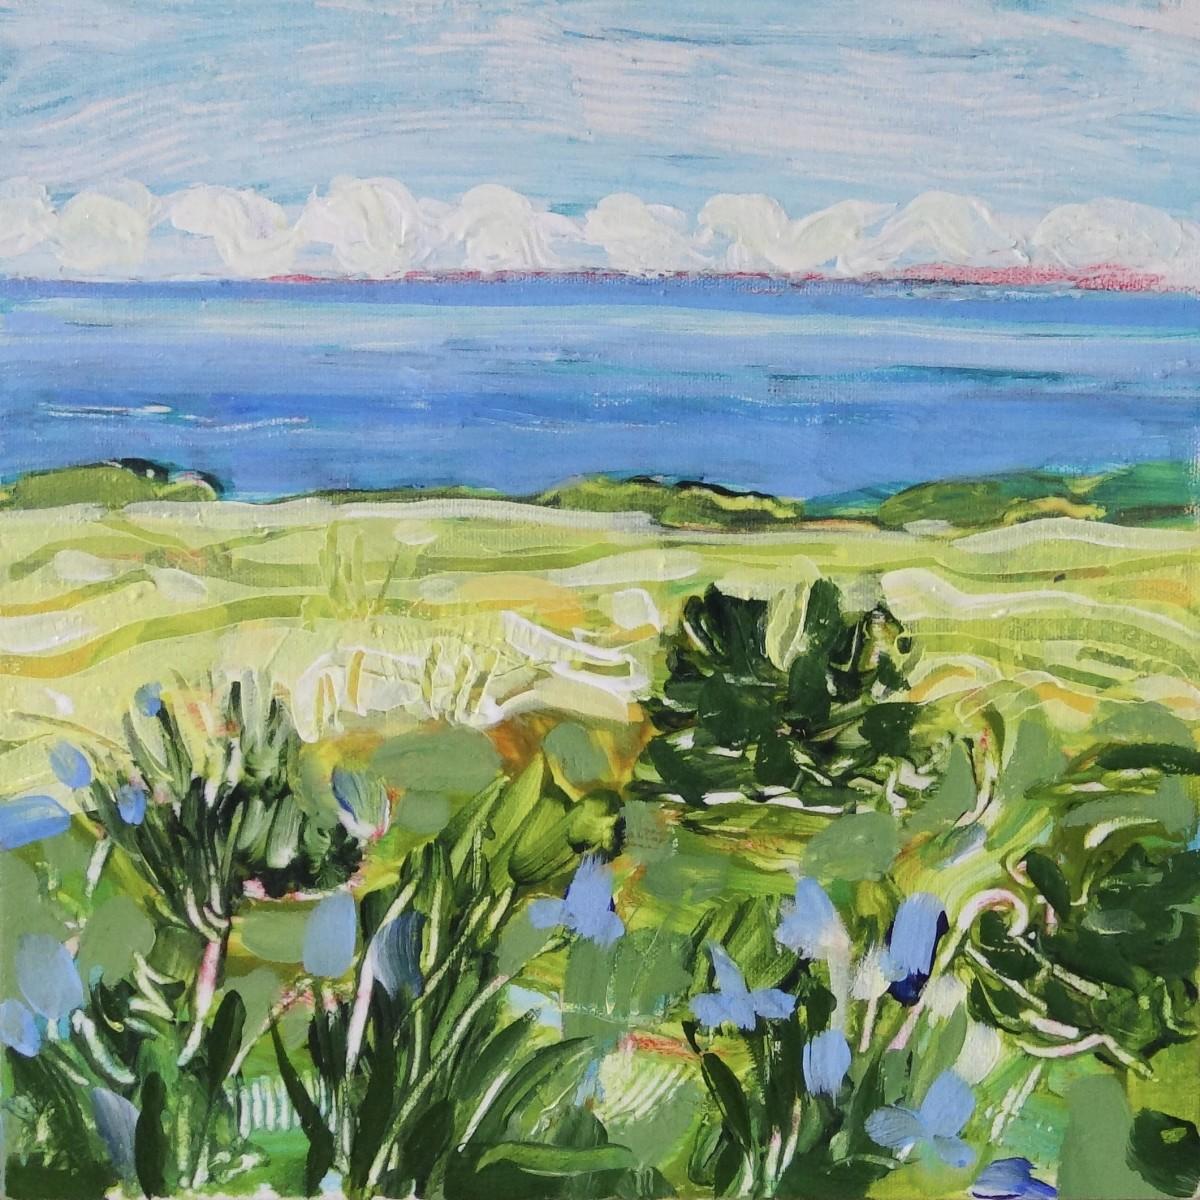 Brier Island, Nova Scotia by Flora Doehler